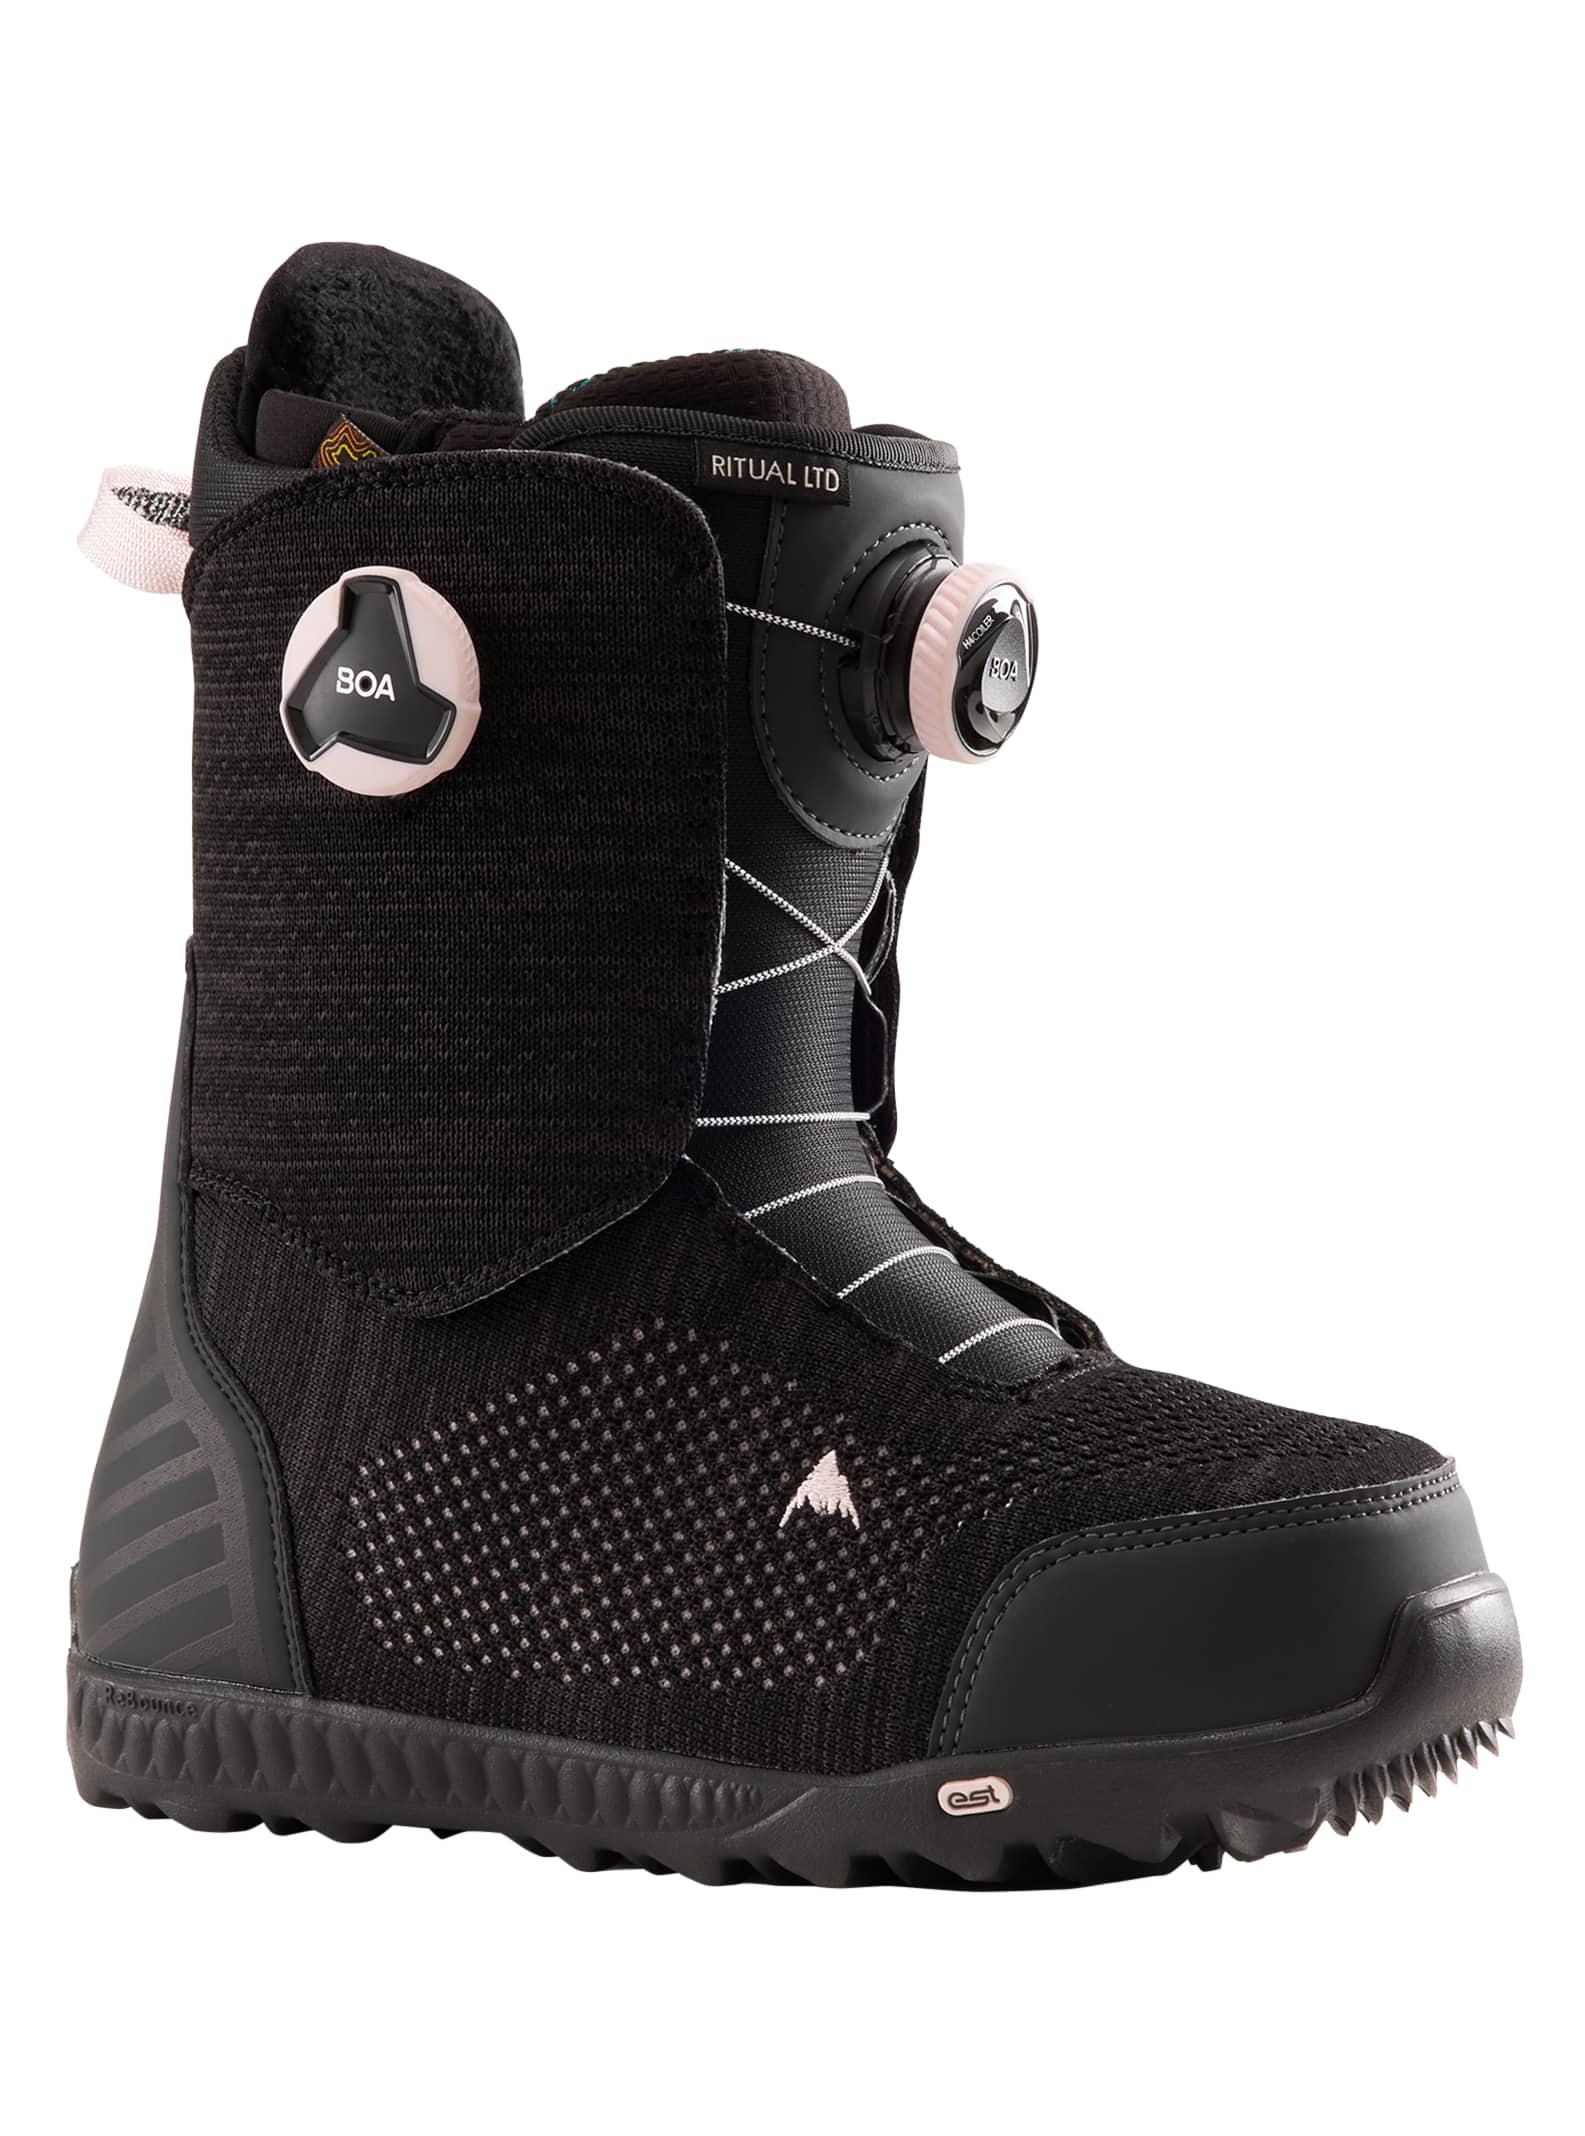 Burton Ritual LTD BOA® snowboardboots för kvinnor, 10